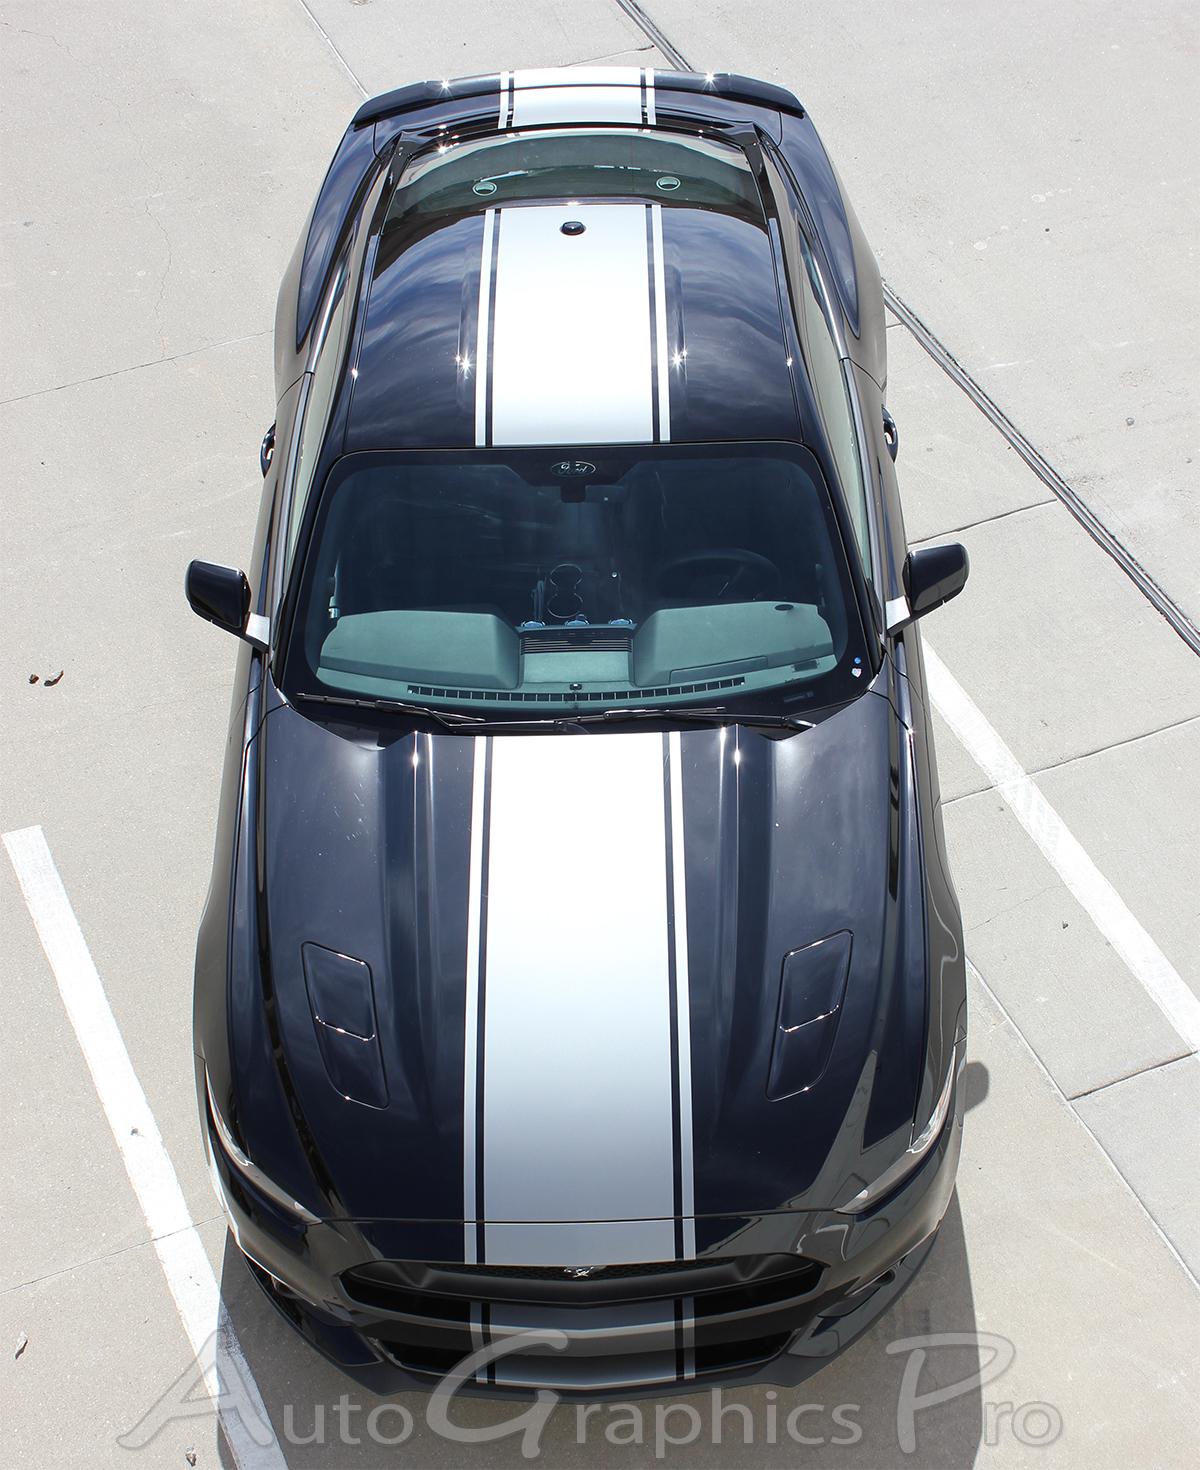 2015 2016 2017 Ford Mustang Super Snake Stripes CONTENDER